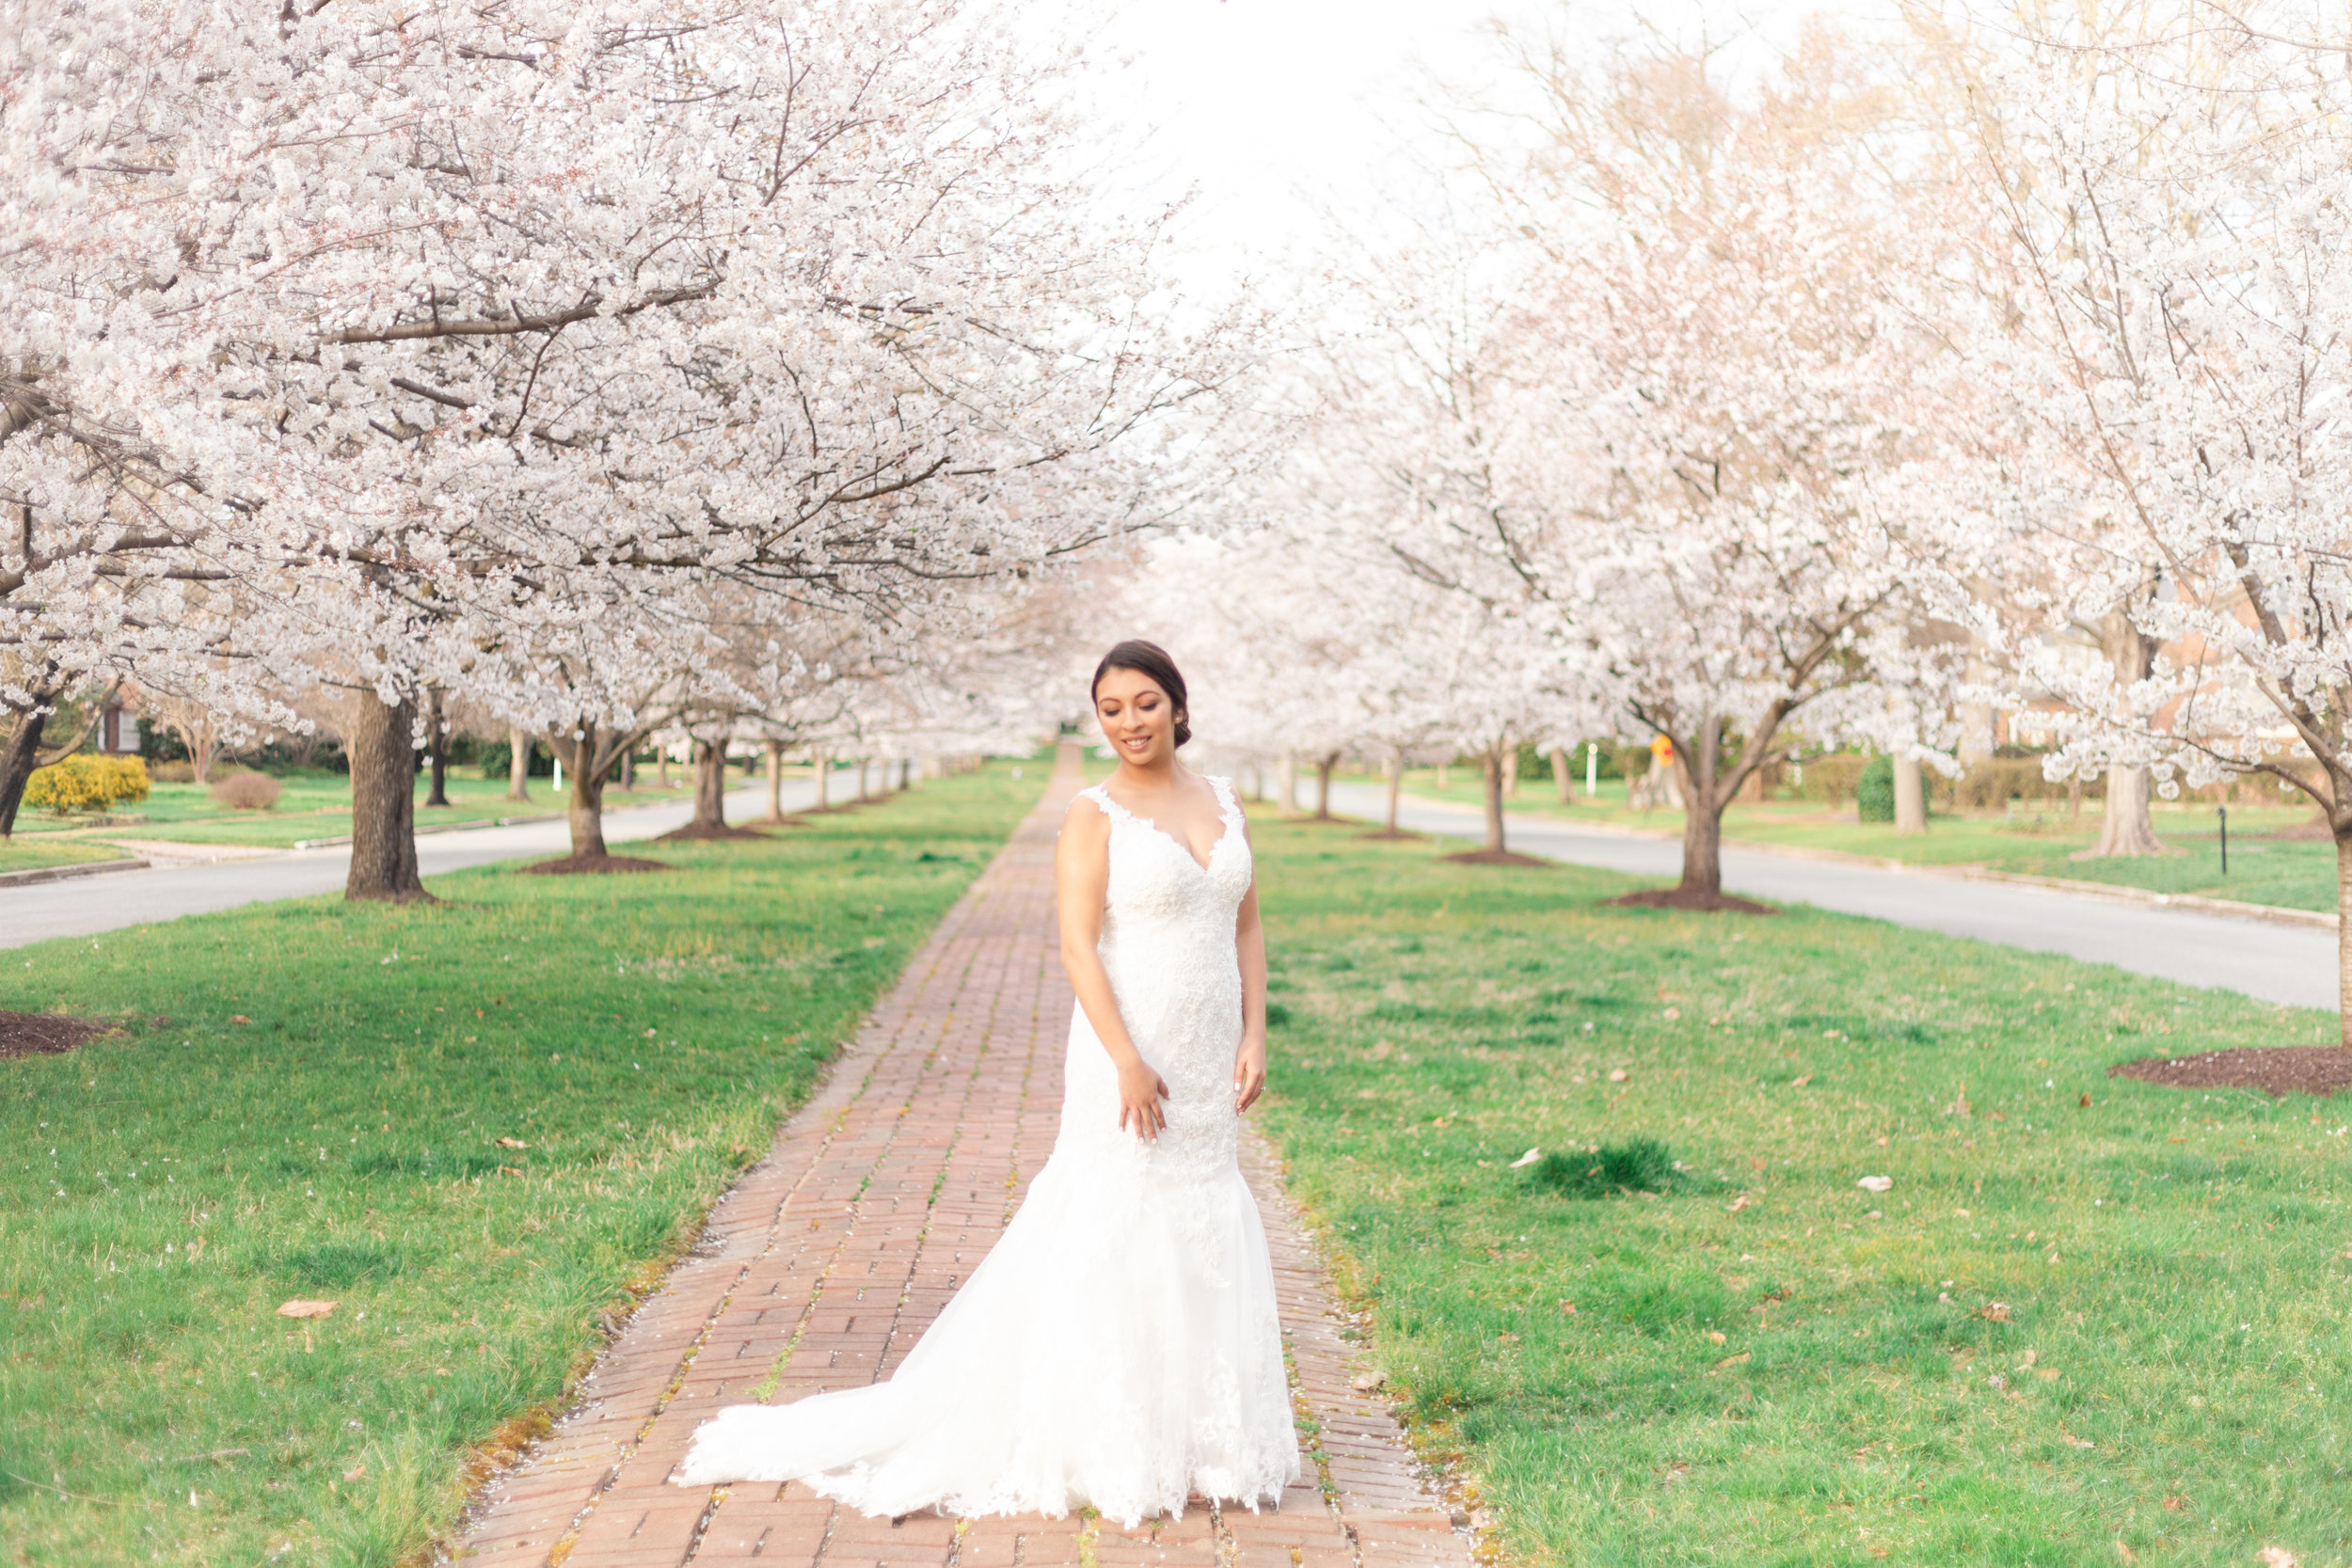 Richmond Cherry Blossom Bridal Session - Richmond VA Wedding Photographer MJ Mendoza Photography